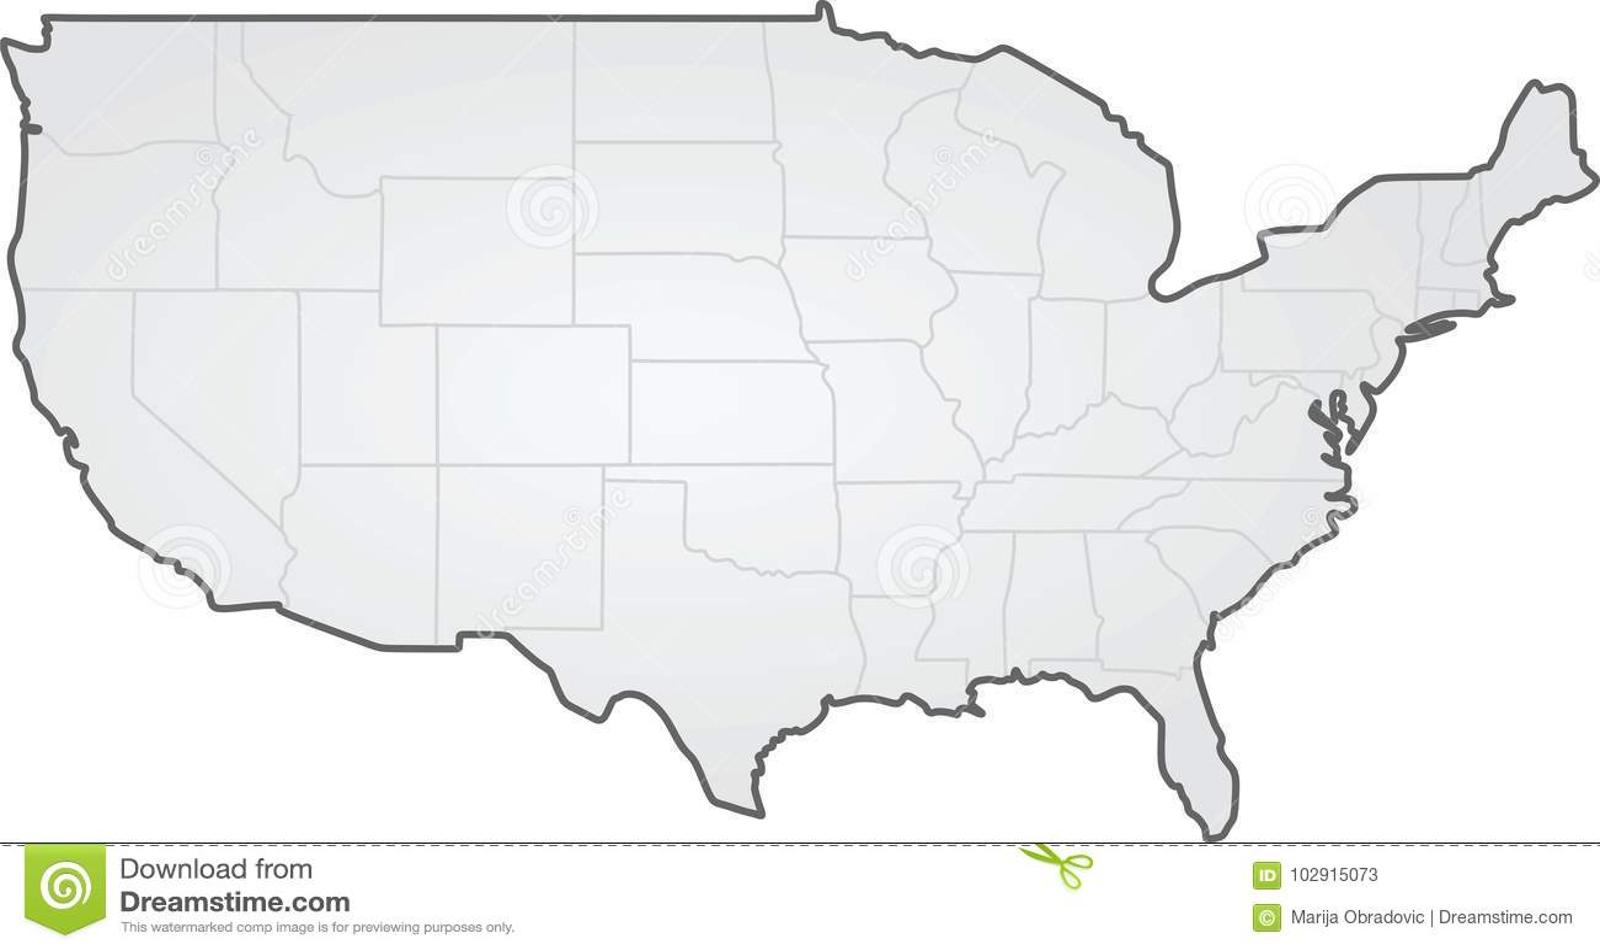 USA. states border map stock vector. Illustration of land - 102915073